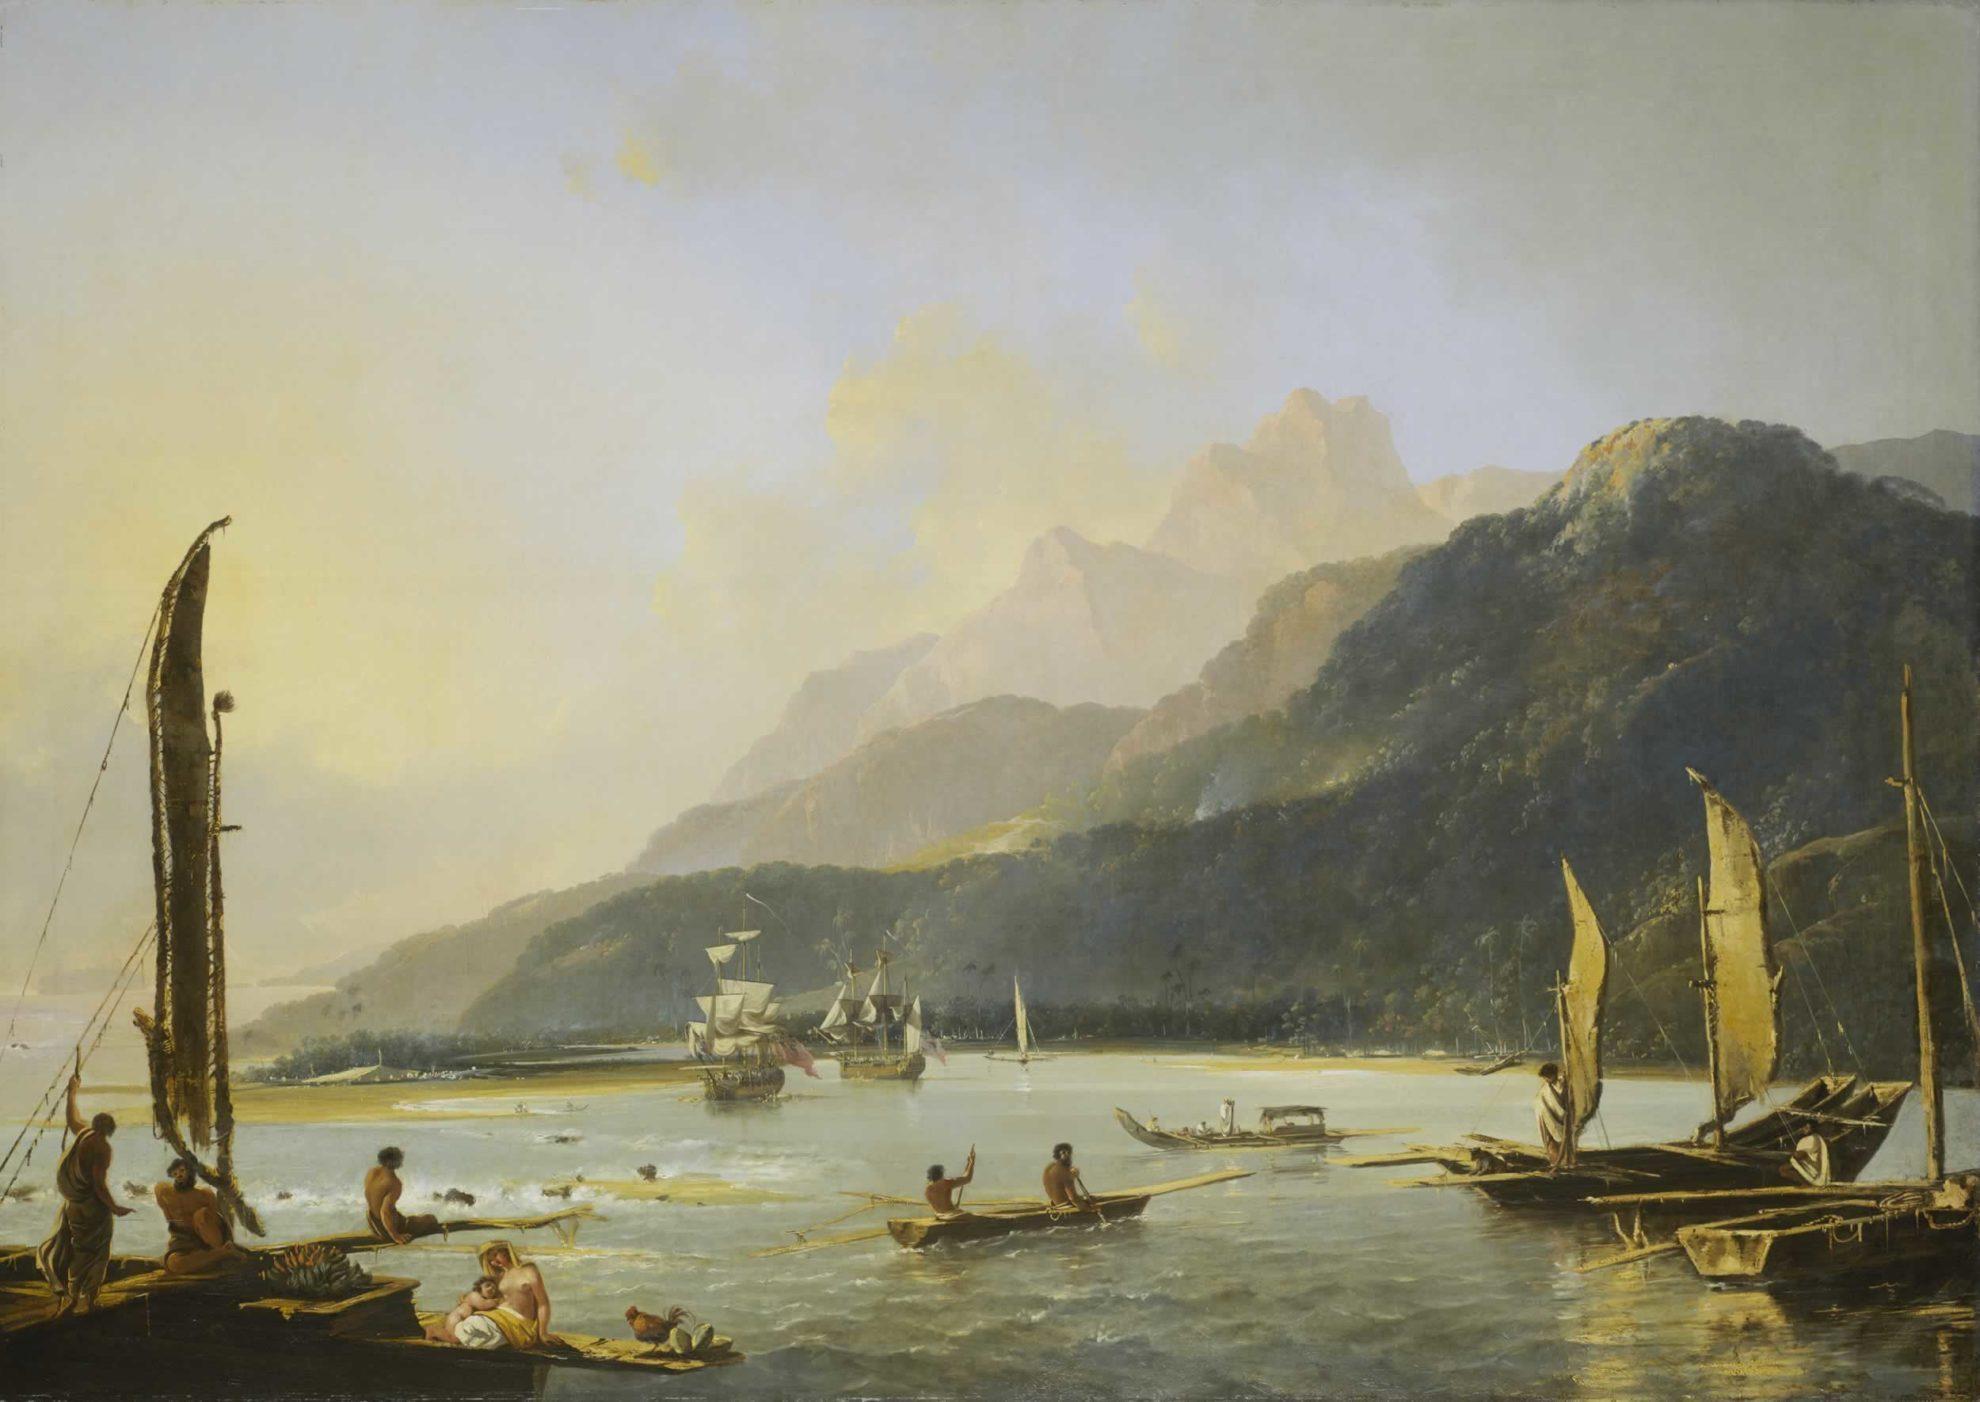 Hodges,_Resolution_and_Adventure_in_Matavai_Bay Резолюшн и Эдвенчур в заливе Матавай Таити. Картина. Автор Уильям Ходжес, 1776